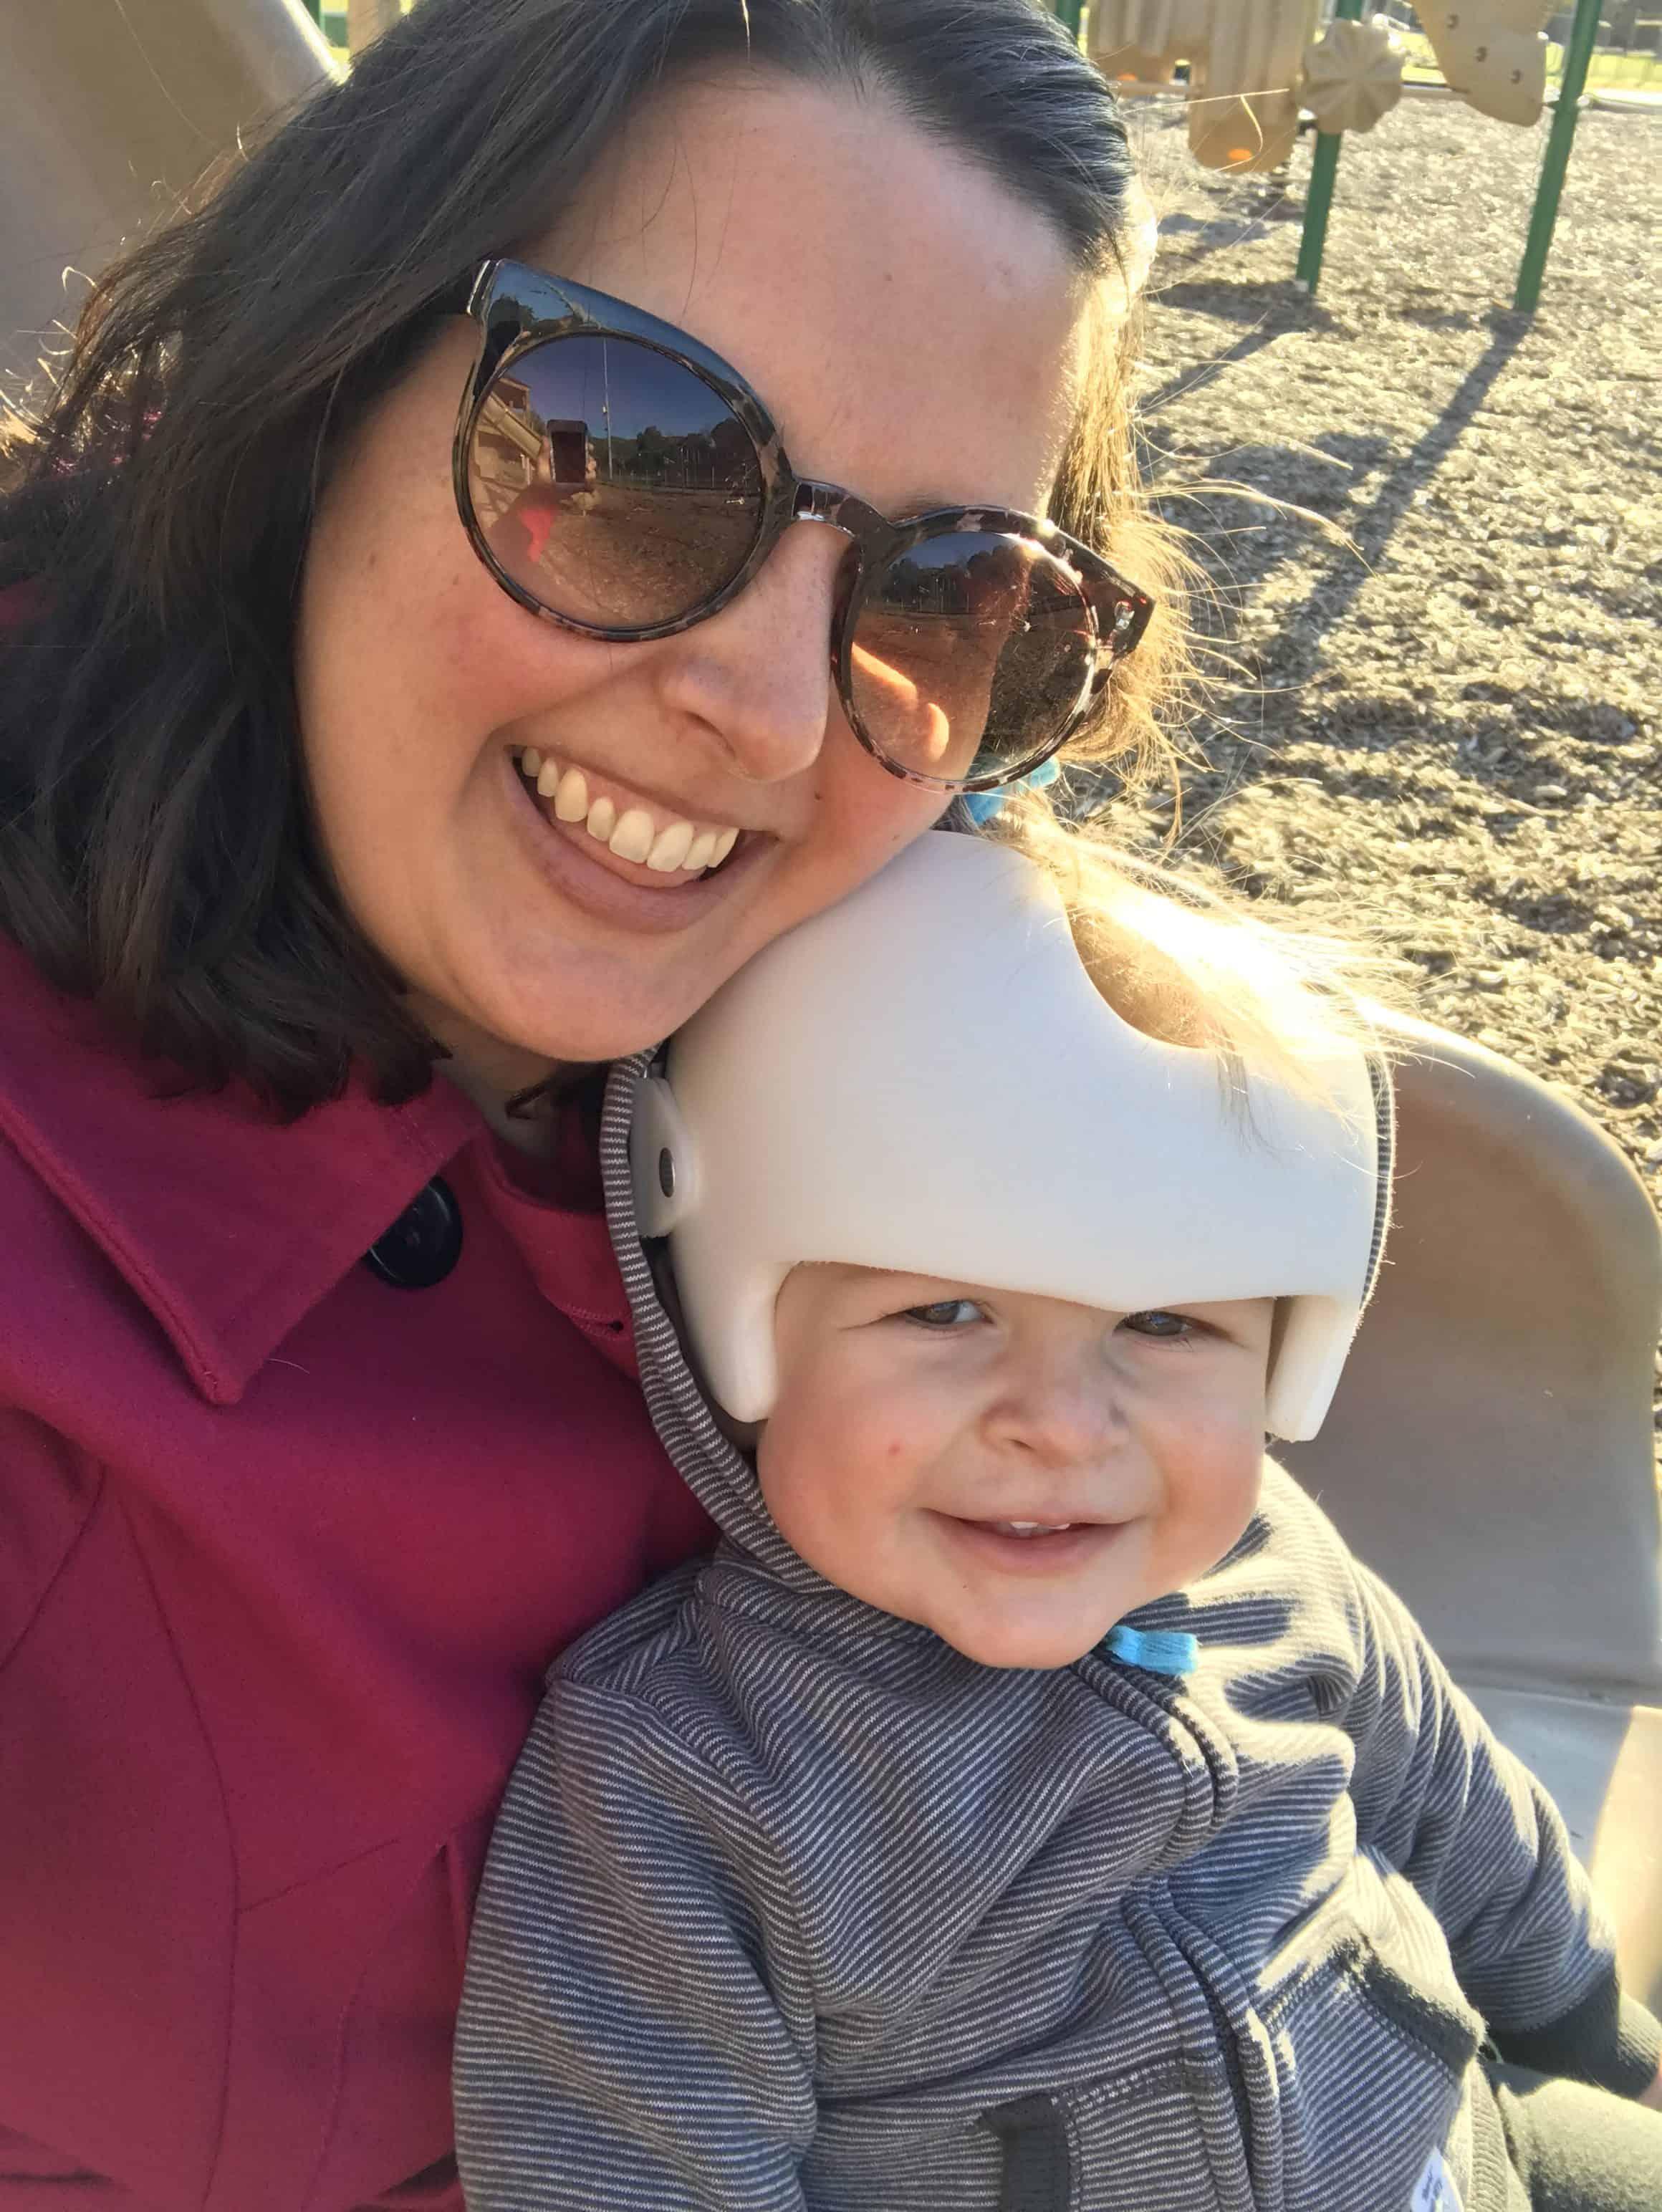 My Baby Wears a Cranial Helmet